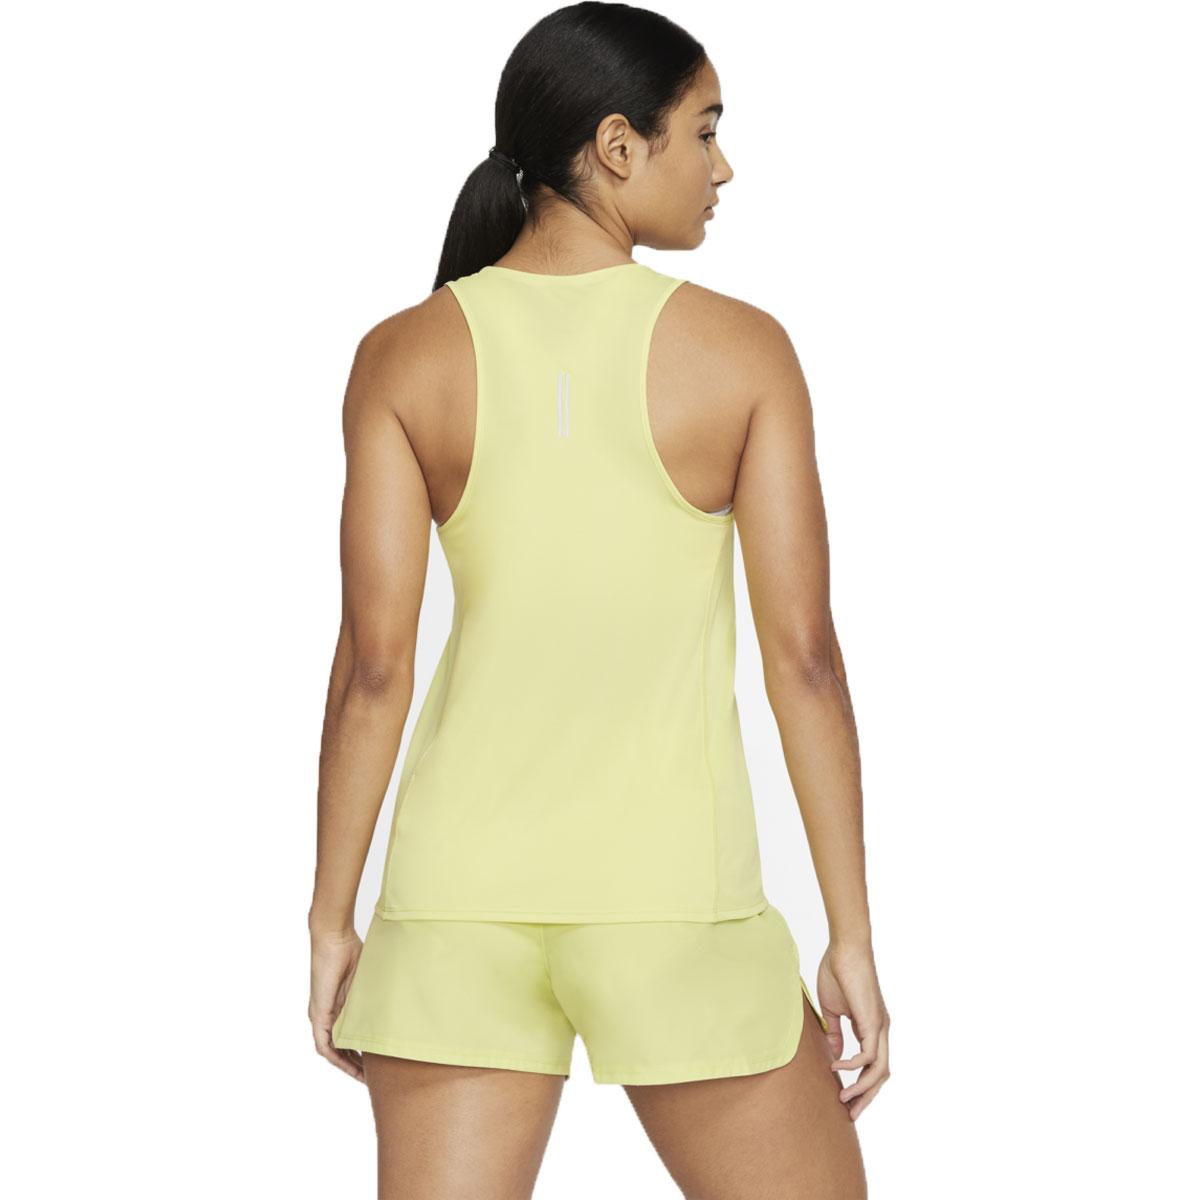 Women's Nike City Sleek Tank - Color: Limelight/Reflective - Size: S, Limelight/Reflective, large, image 4